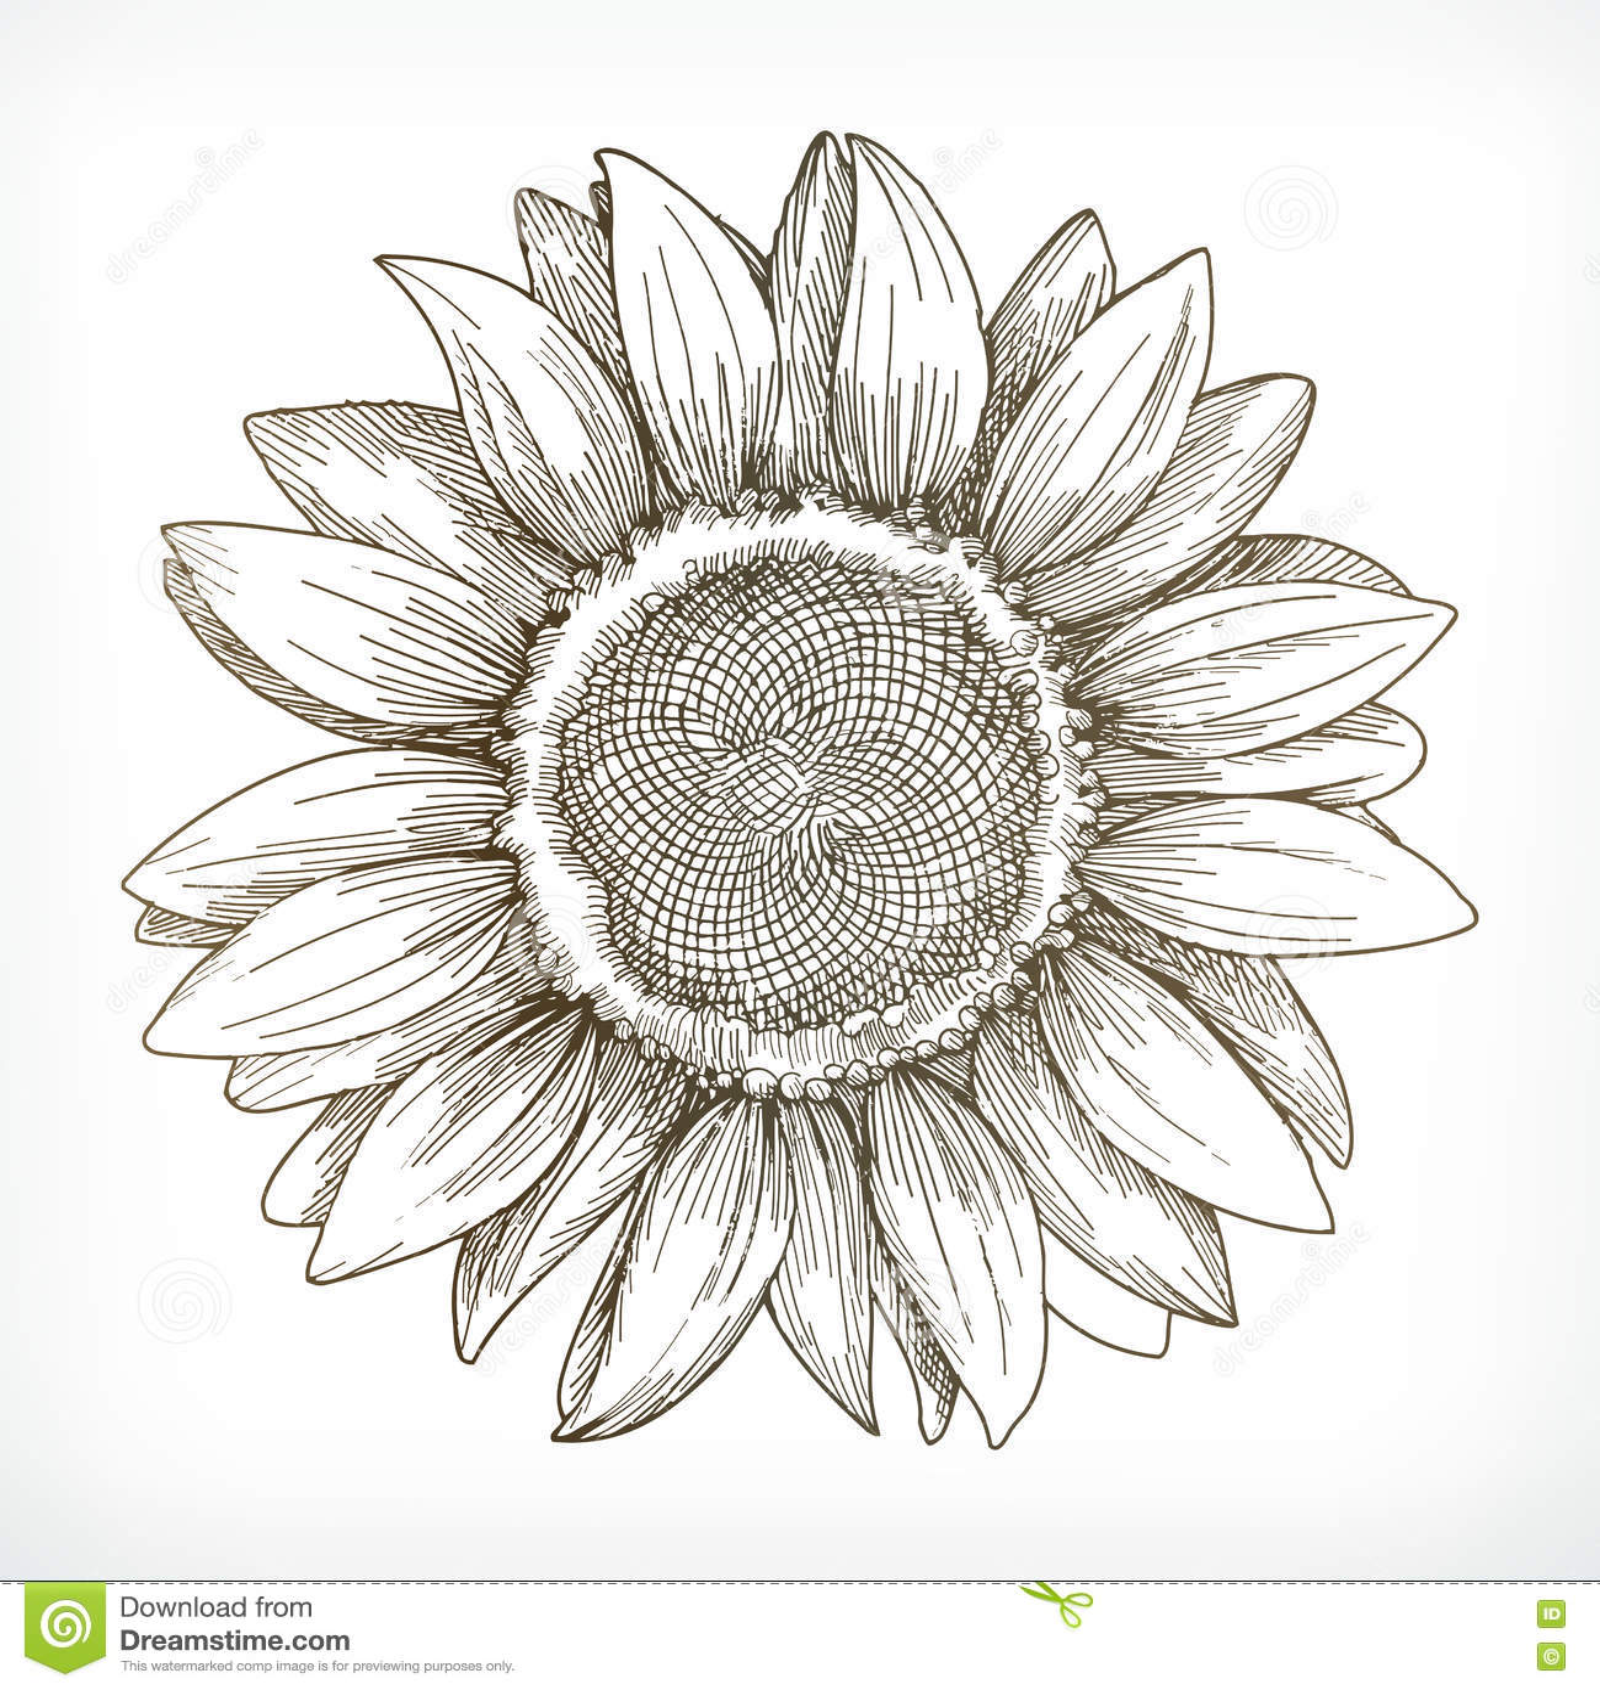 Croquis de tournesol dessin de main illustration de - Dessin de tournesol ...